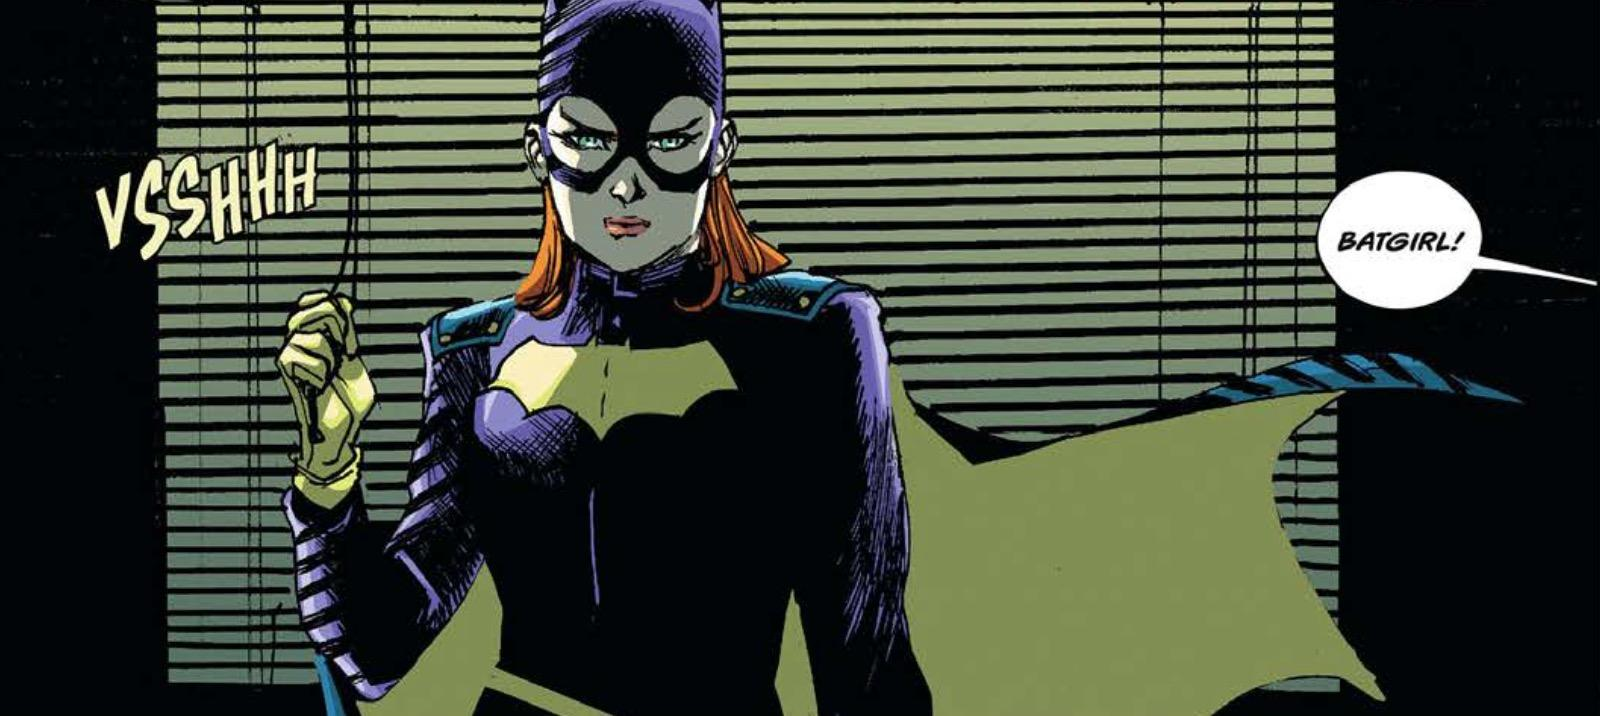 batgirl-4-panel-2